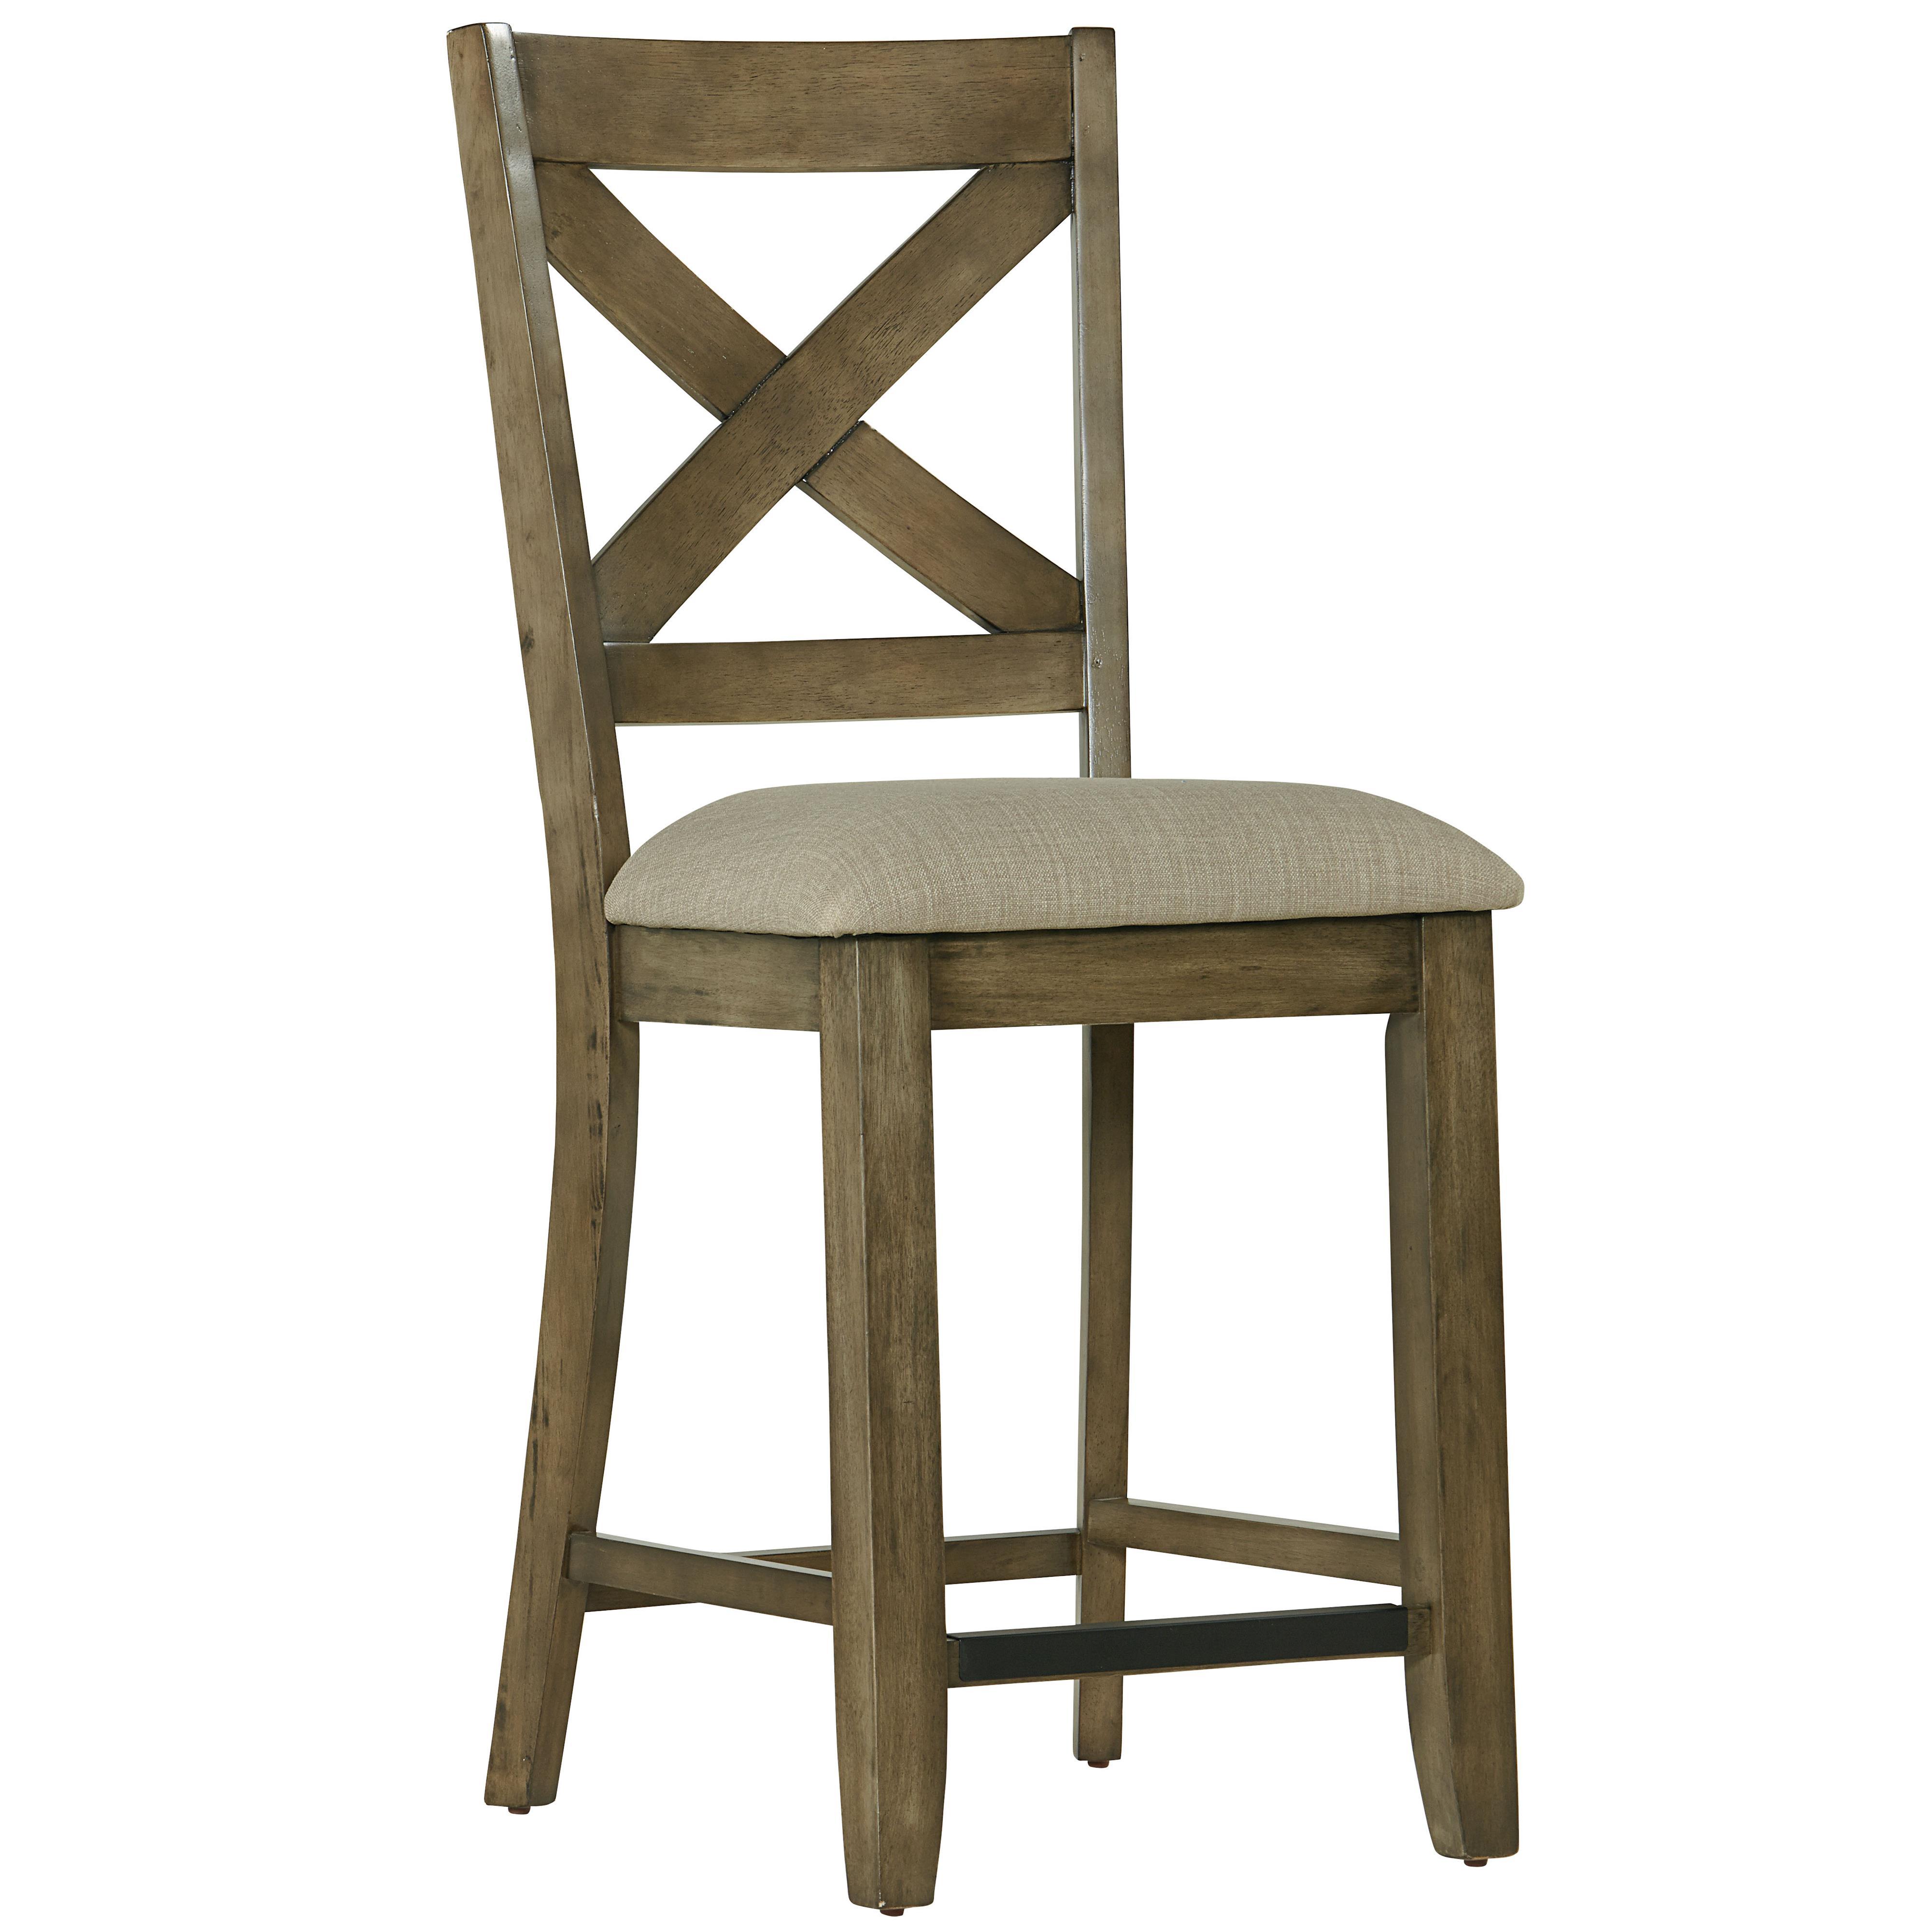 bar stool chair grey tub for elderly standard furniture omaha counter height